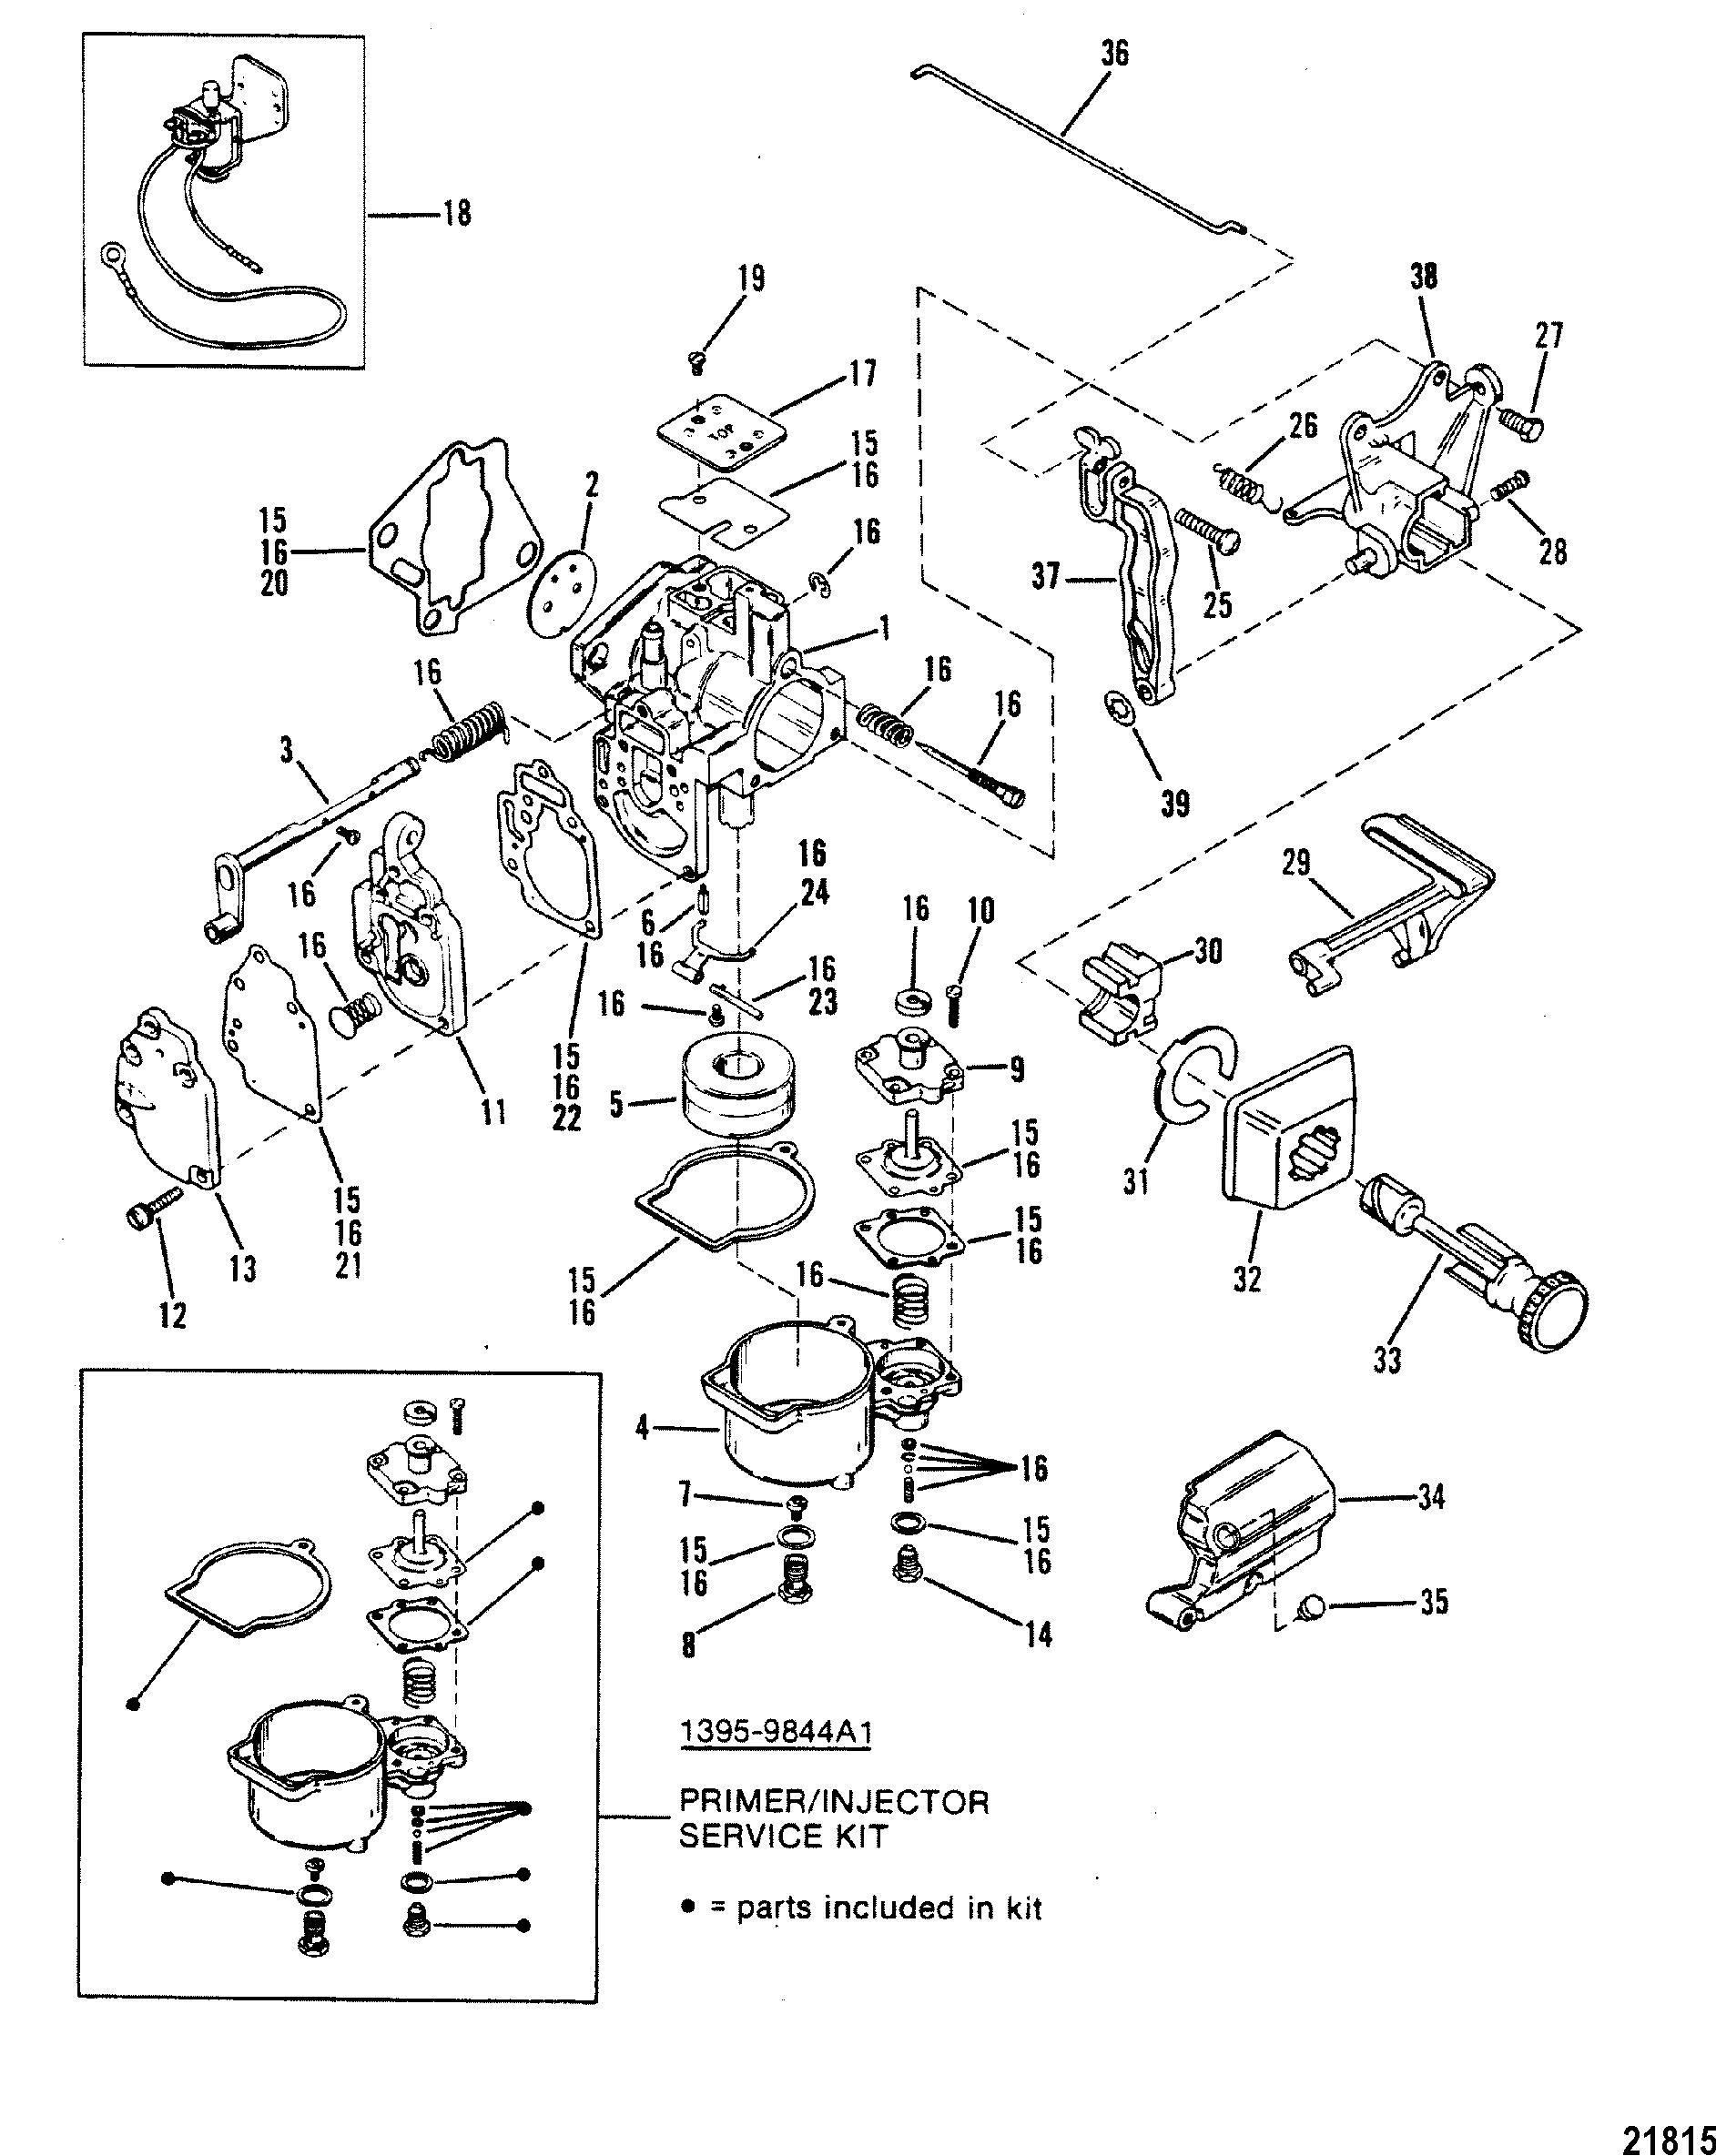 http://www.mercury-lakor.com/system/catalog/LSDATA/COMMON/21815.png